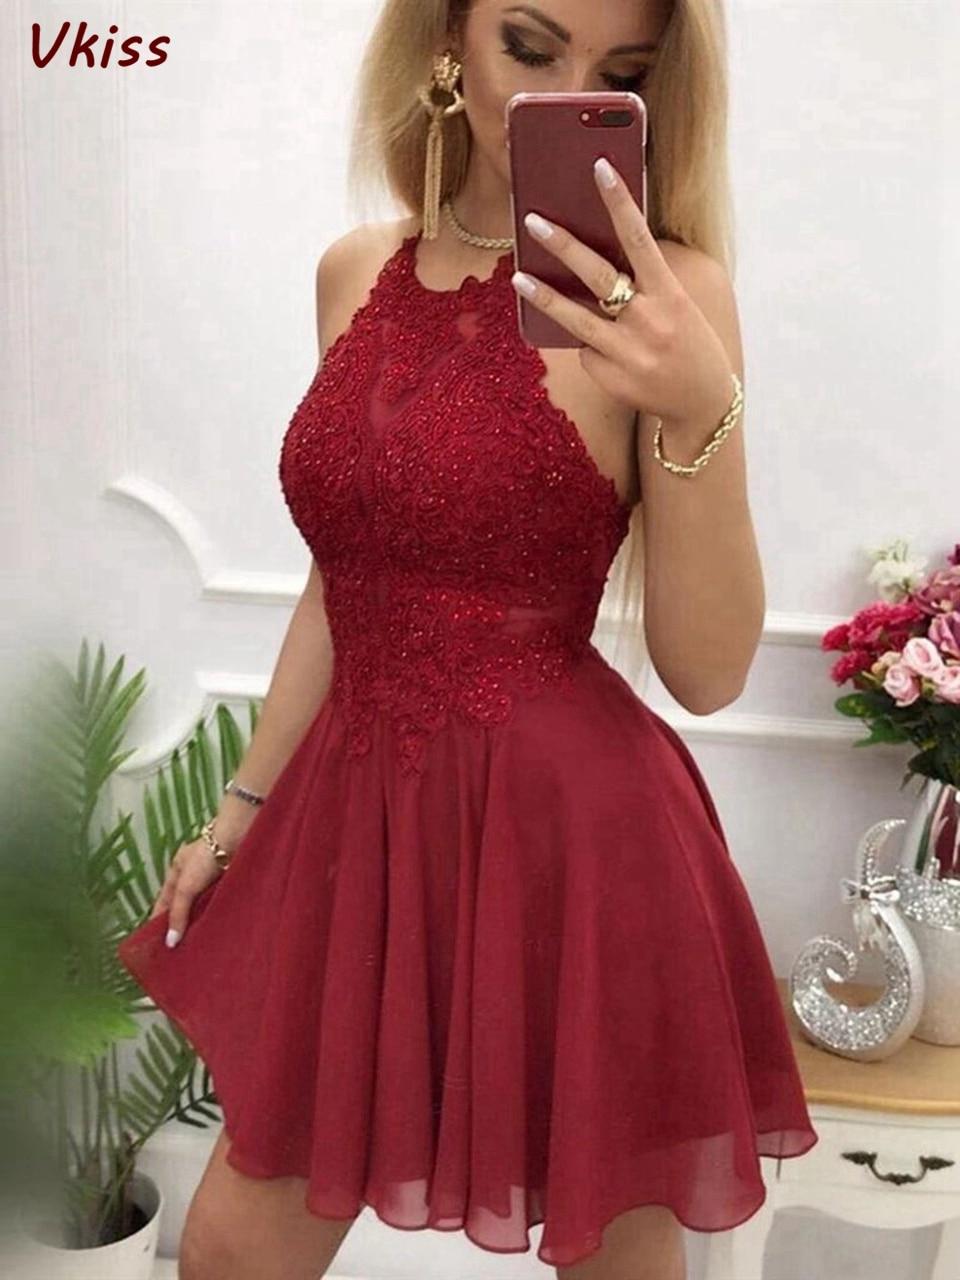 2020 Formal Party Sexy Homecoming Dresses Red Short Prom A-Line Elegant Cocktail Vestidos De Gala Women Graduation Dress